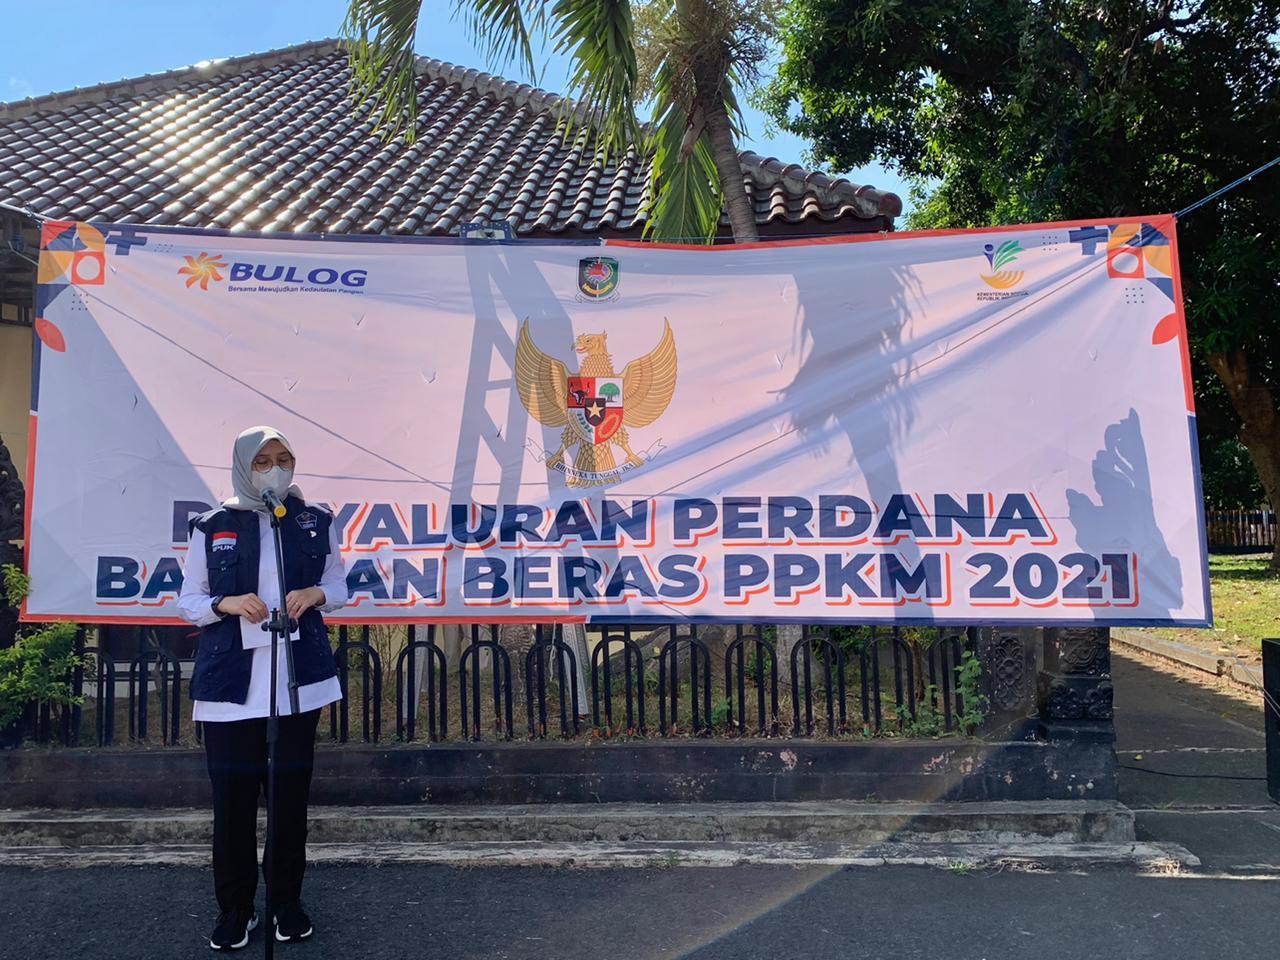 PPKM, Pemkab Banyuwangi Salurkan Bansos Beras kepada 119 Ribu KPM